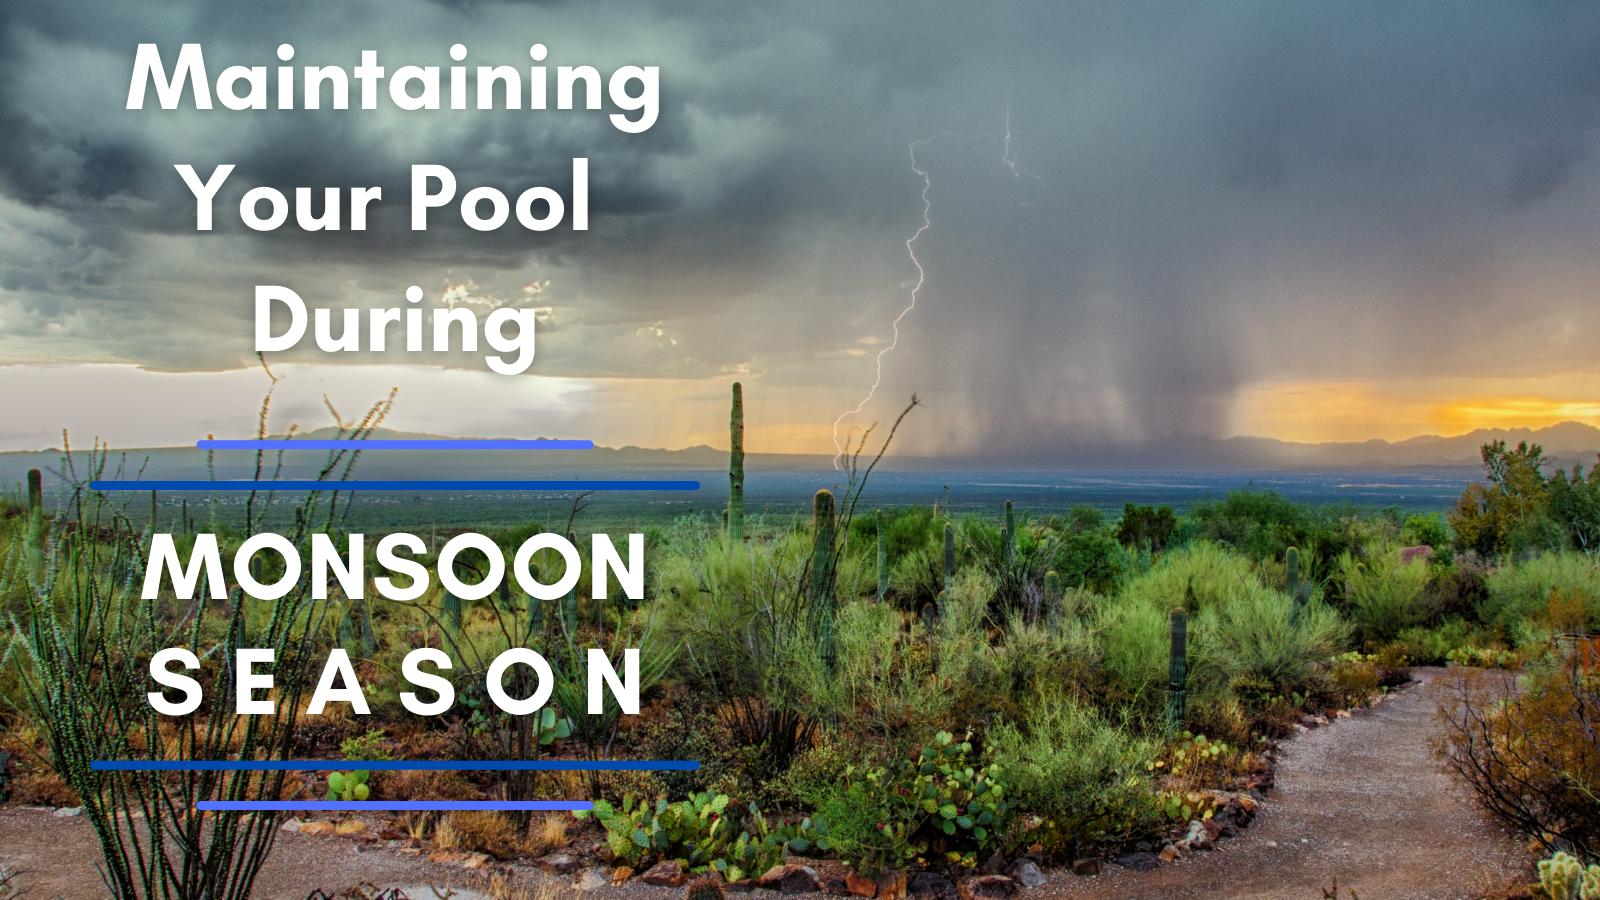 Maintaining Your Pool During Monsoon Season